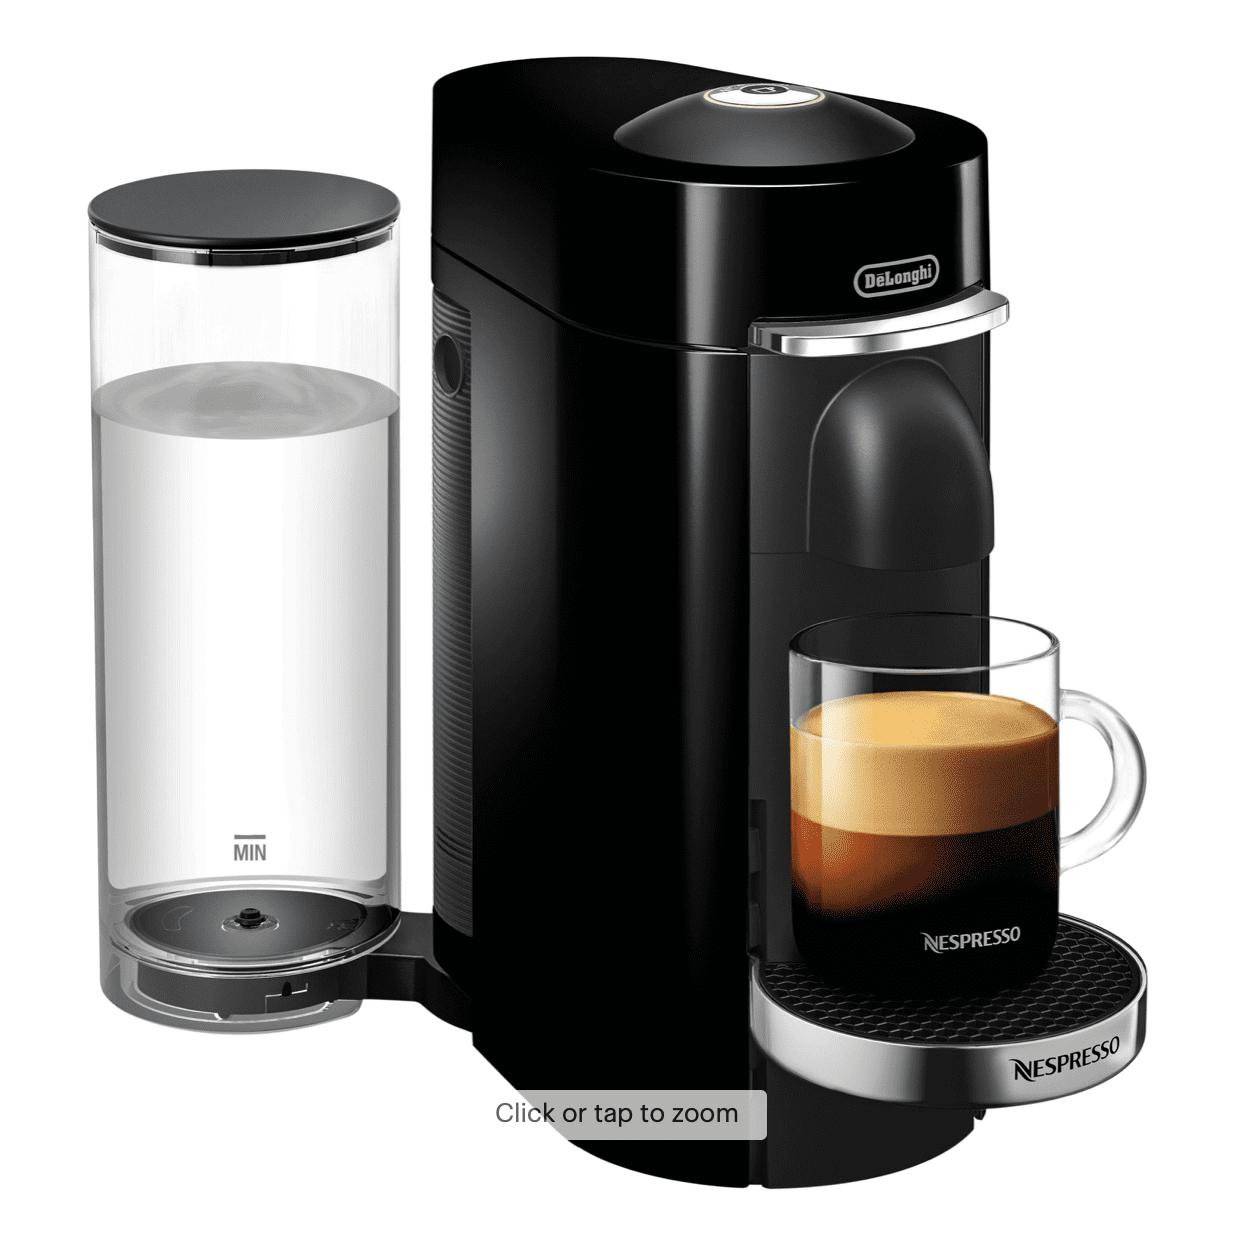 Best Buy: Nessprisso-VertuoPlus Coffee Maker For .99